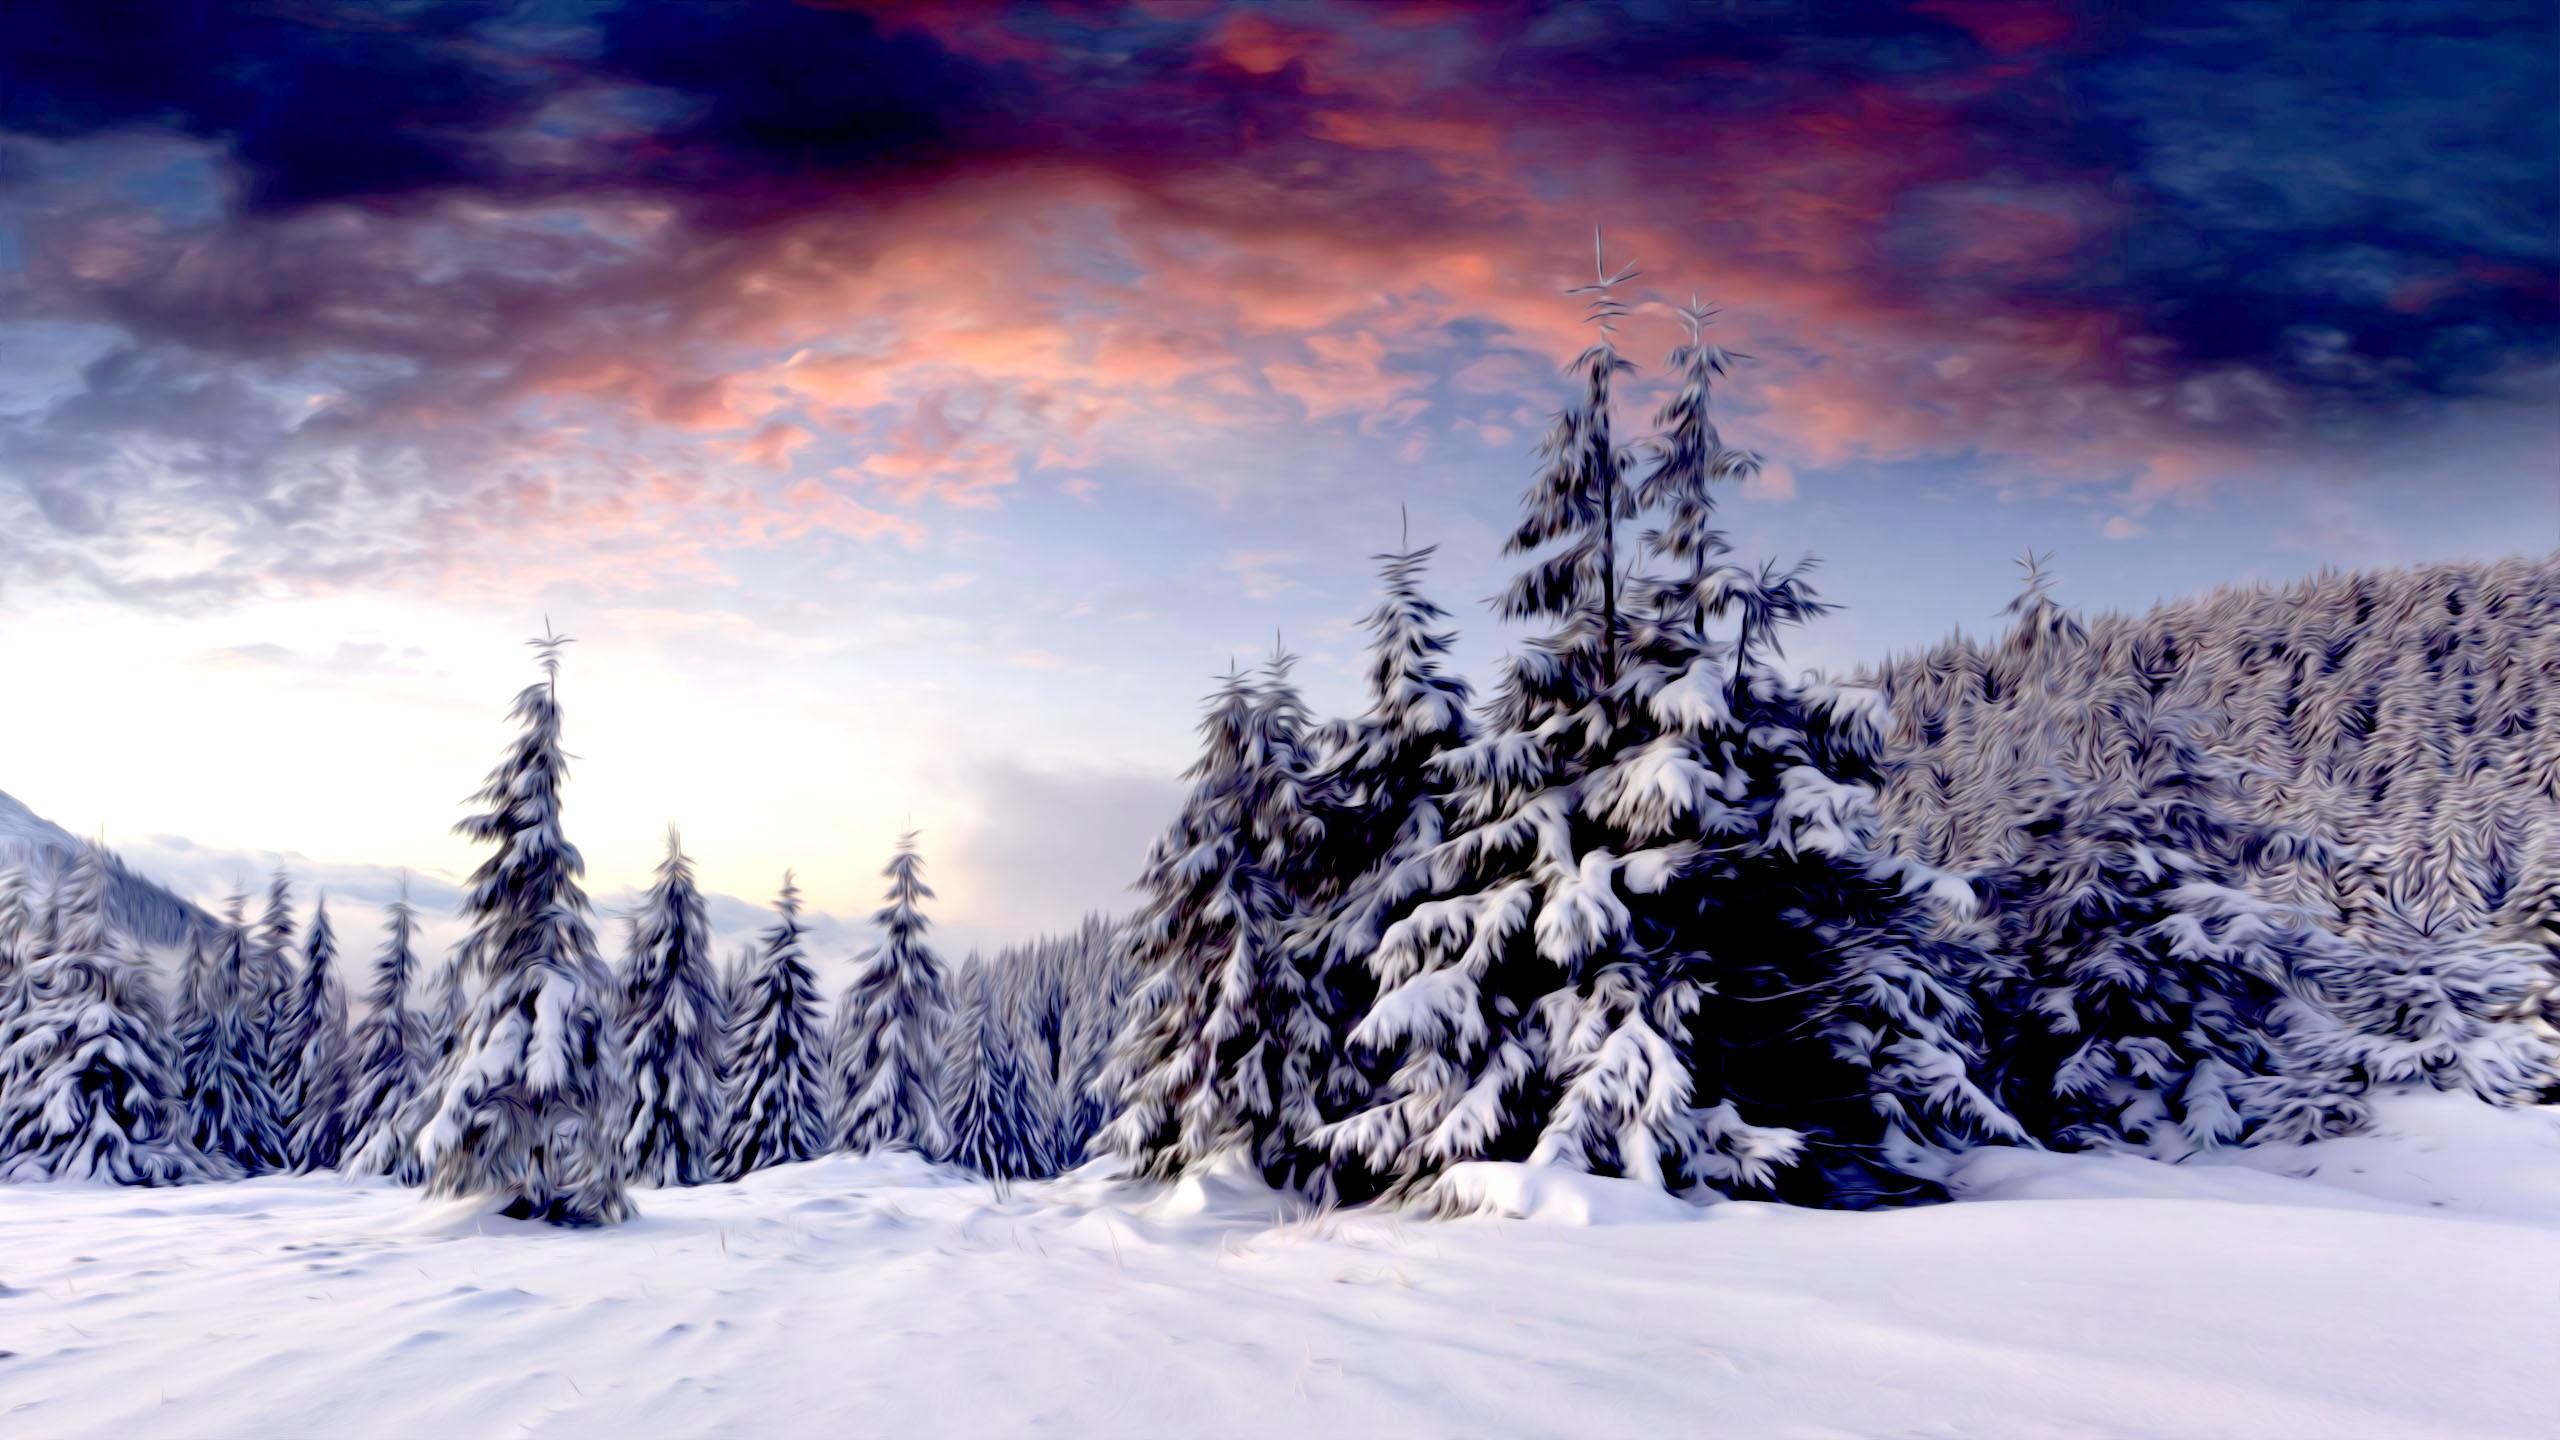 Winter Scenic Wallpaper (60+ images)